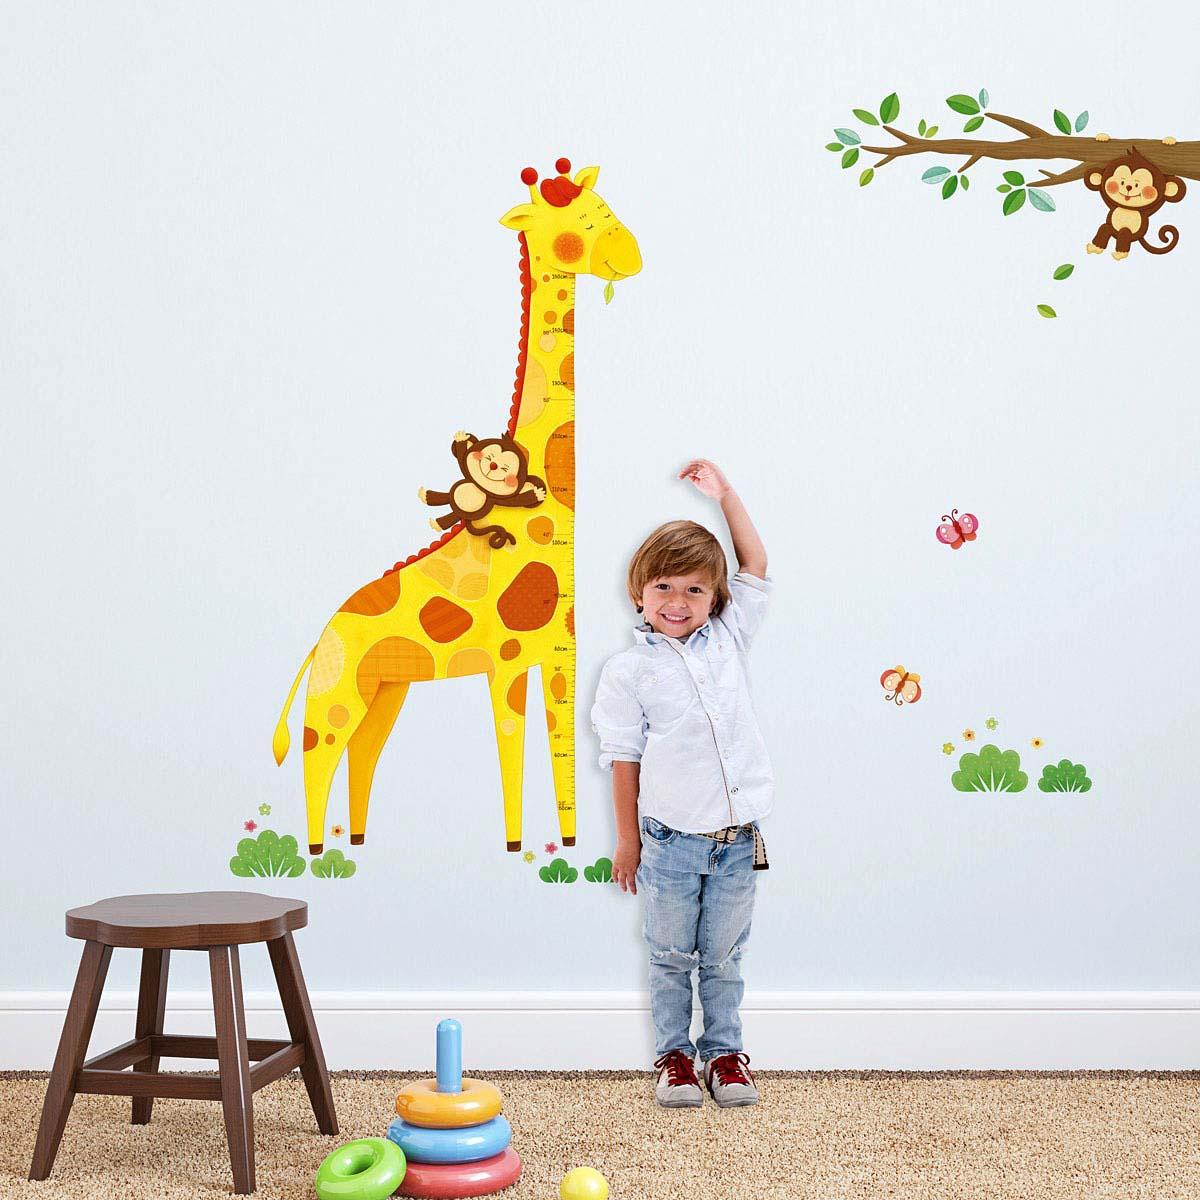 Full Size of Messlatte Kinderzimmer Giraffe Wandsticker Tapetenwelt Regal Regale Weiß Sofa Kinderzimmer Messlatte Kinderzimmer